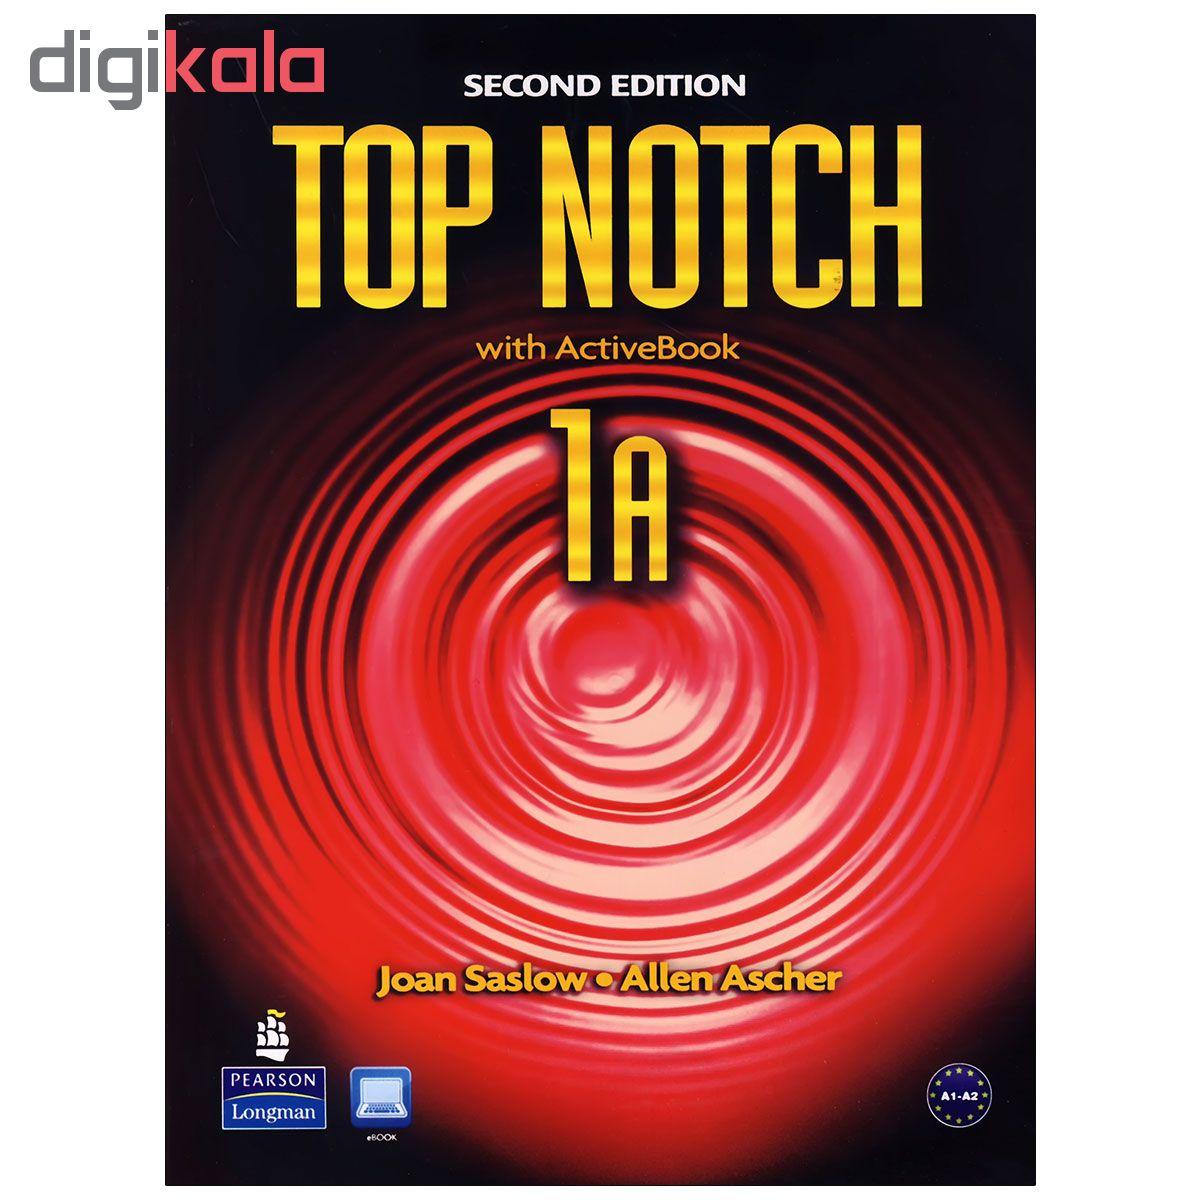 خرید                      کتاب Top notch 1A 2nd Edition اثر Joan Saslow And Allen Ascher انتشارات Pearson